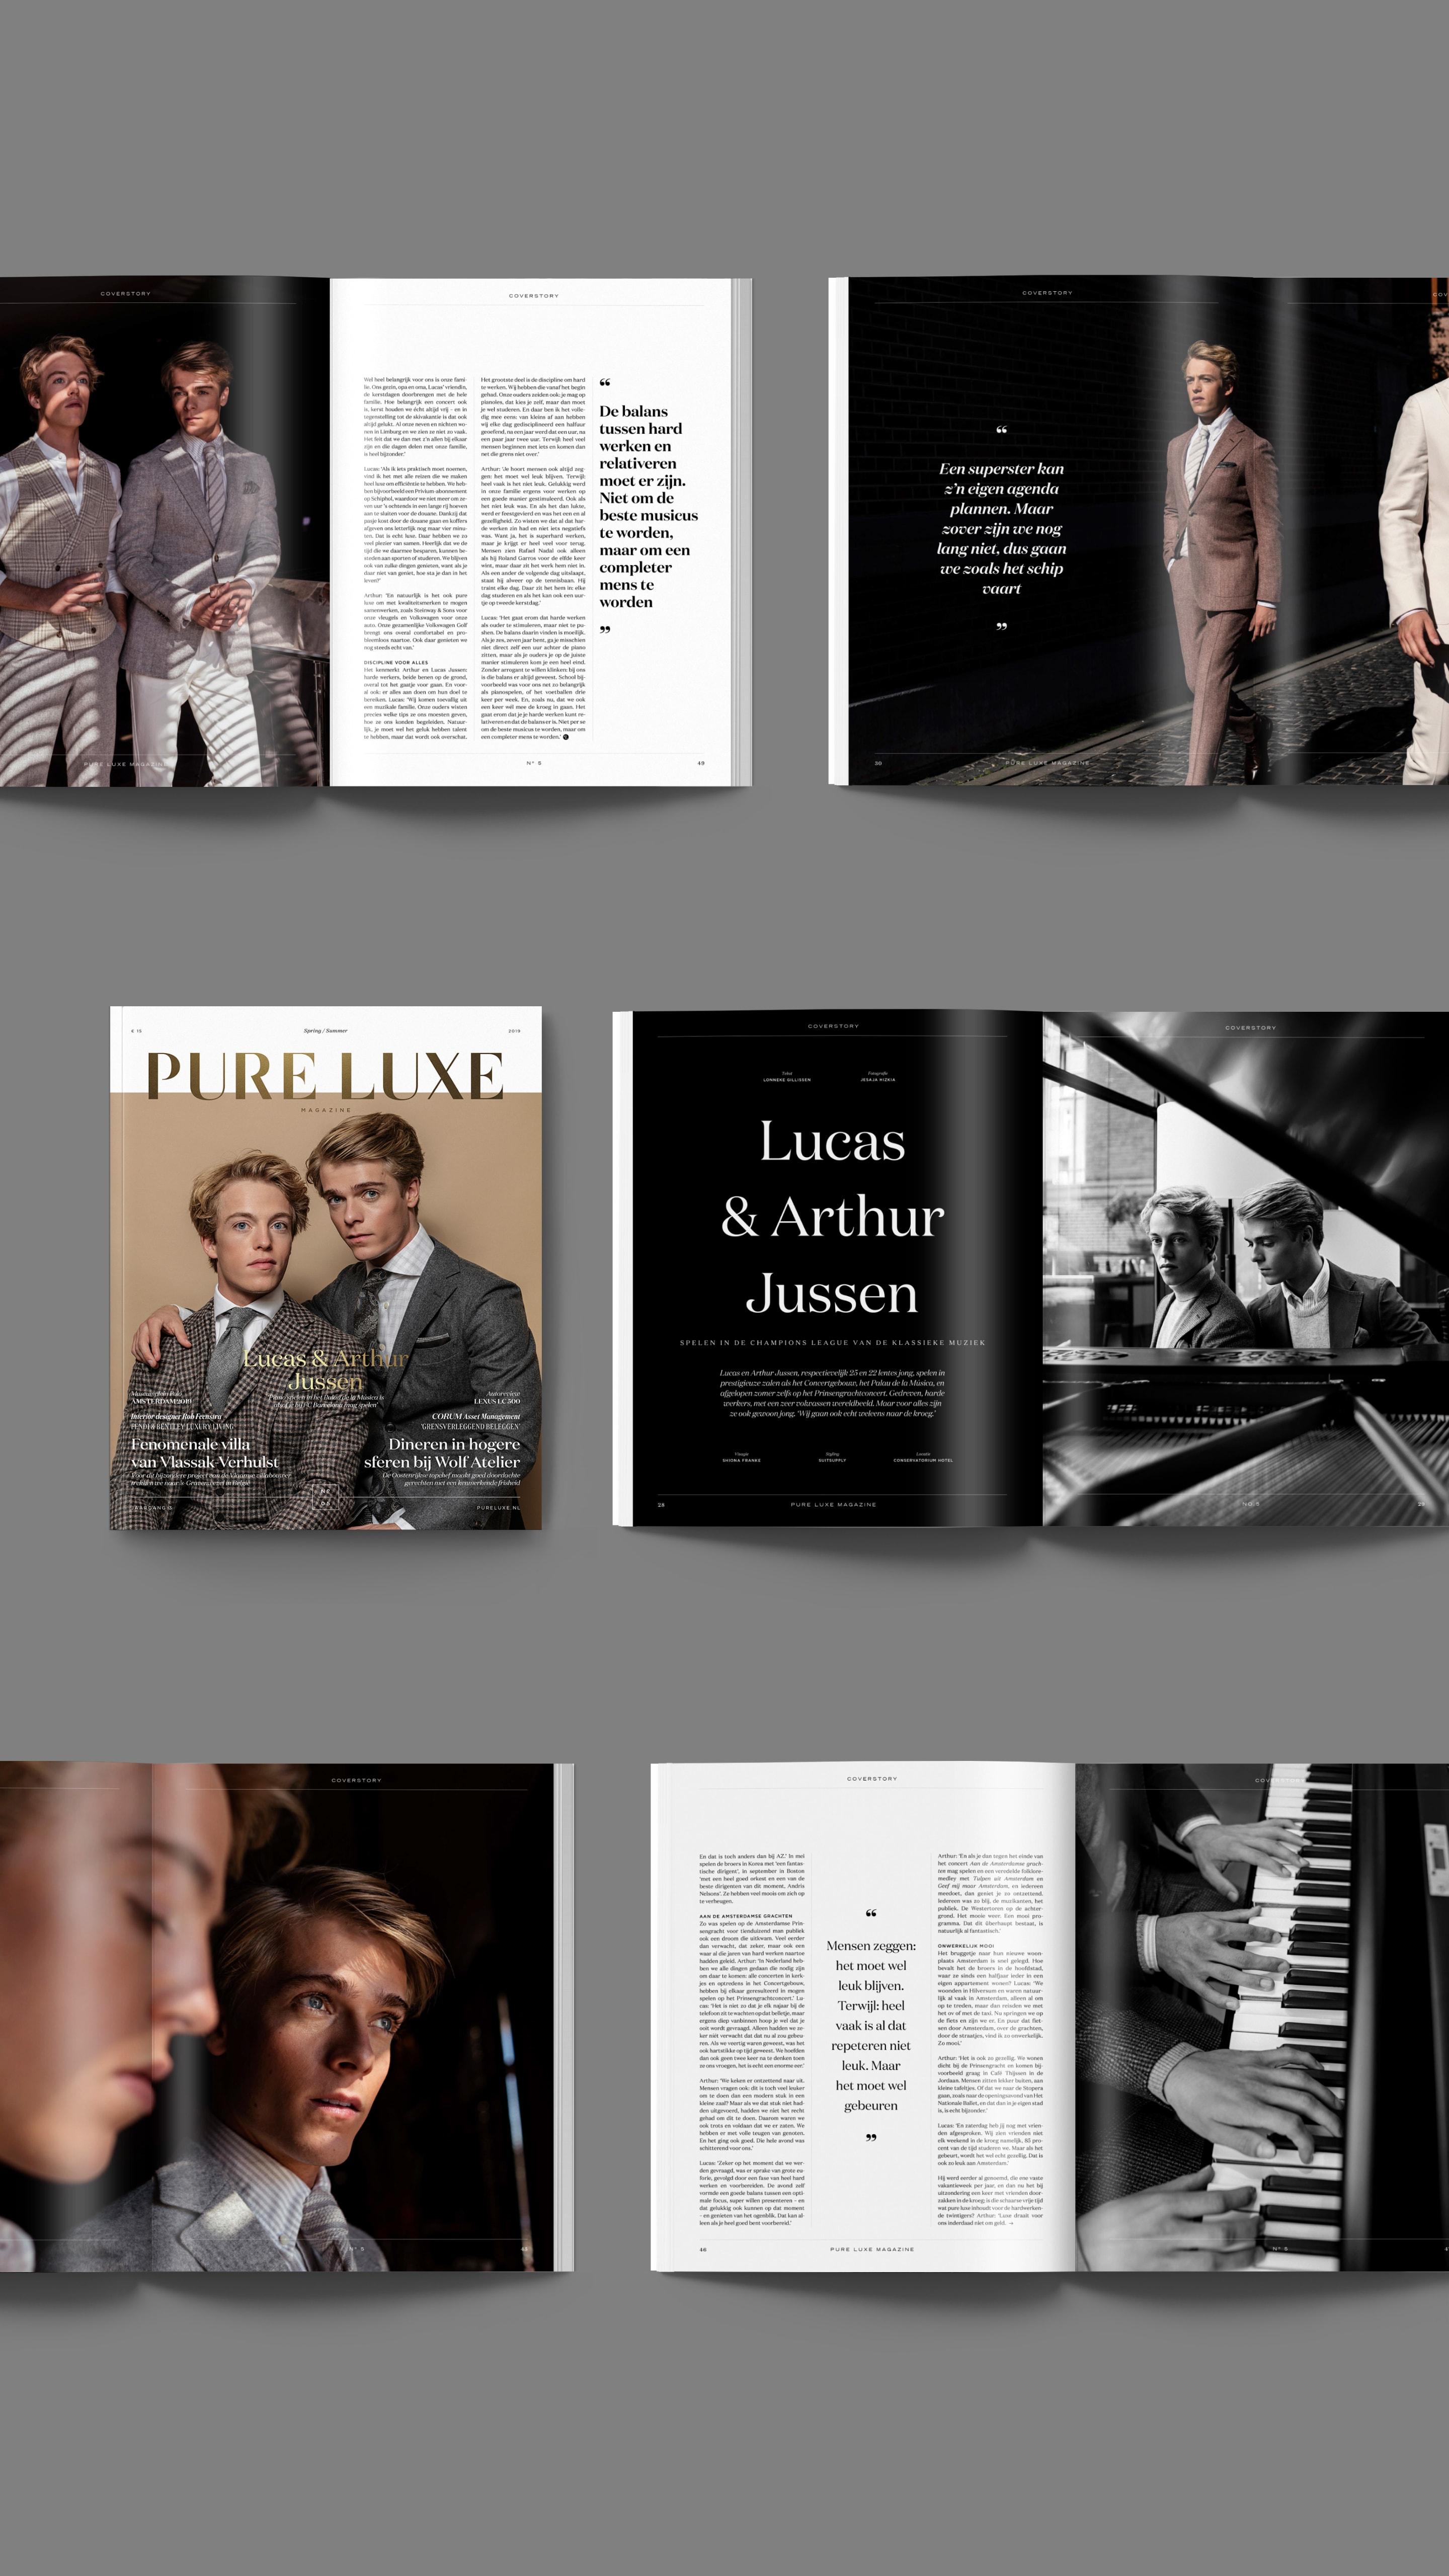 PL-Print-Magazine-4-2